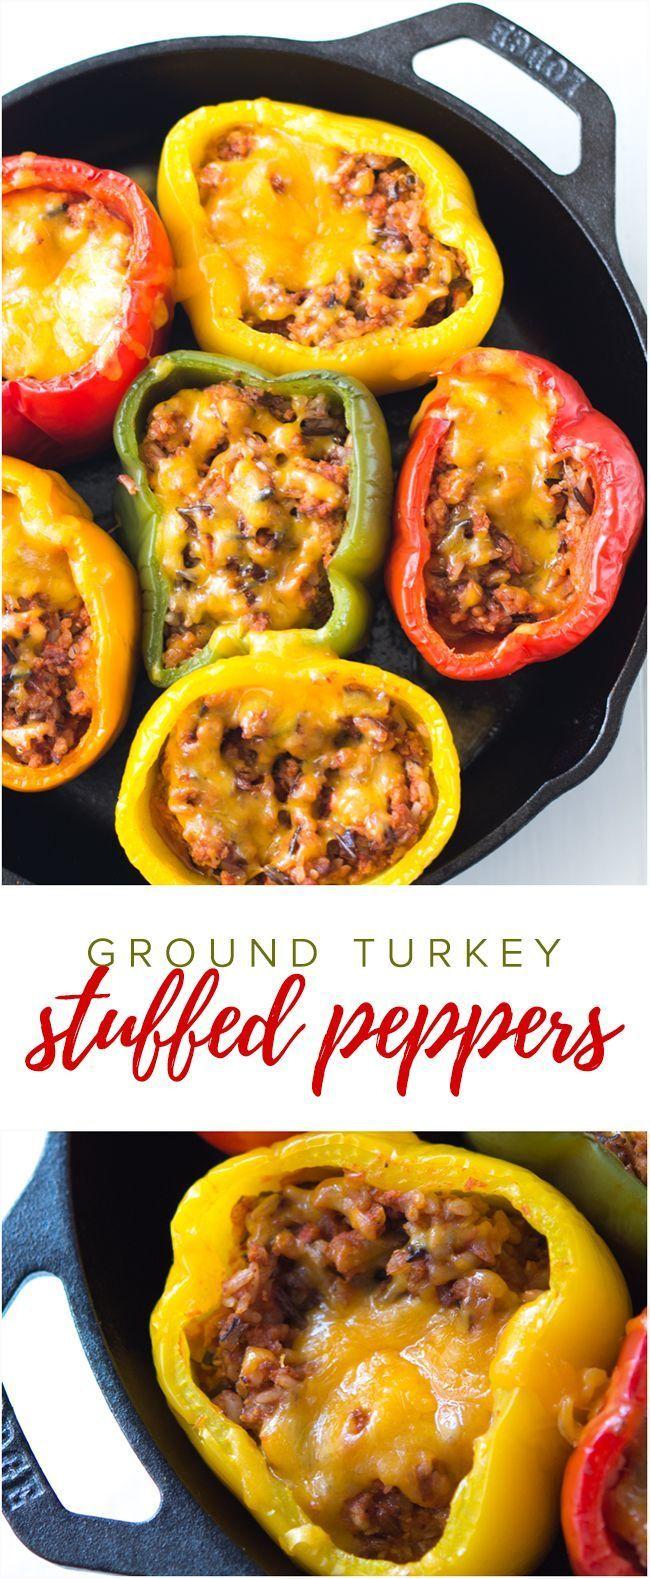 Ground turkeys Stuffed peppers - Faves - Stuffed ...   - Healthy food -